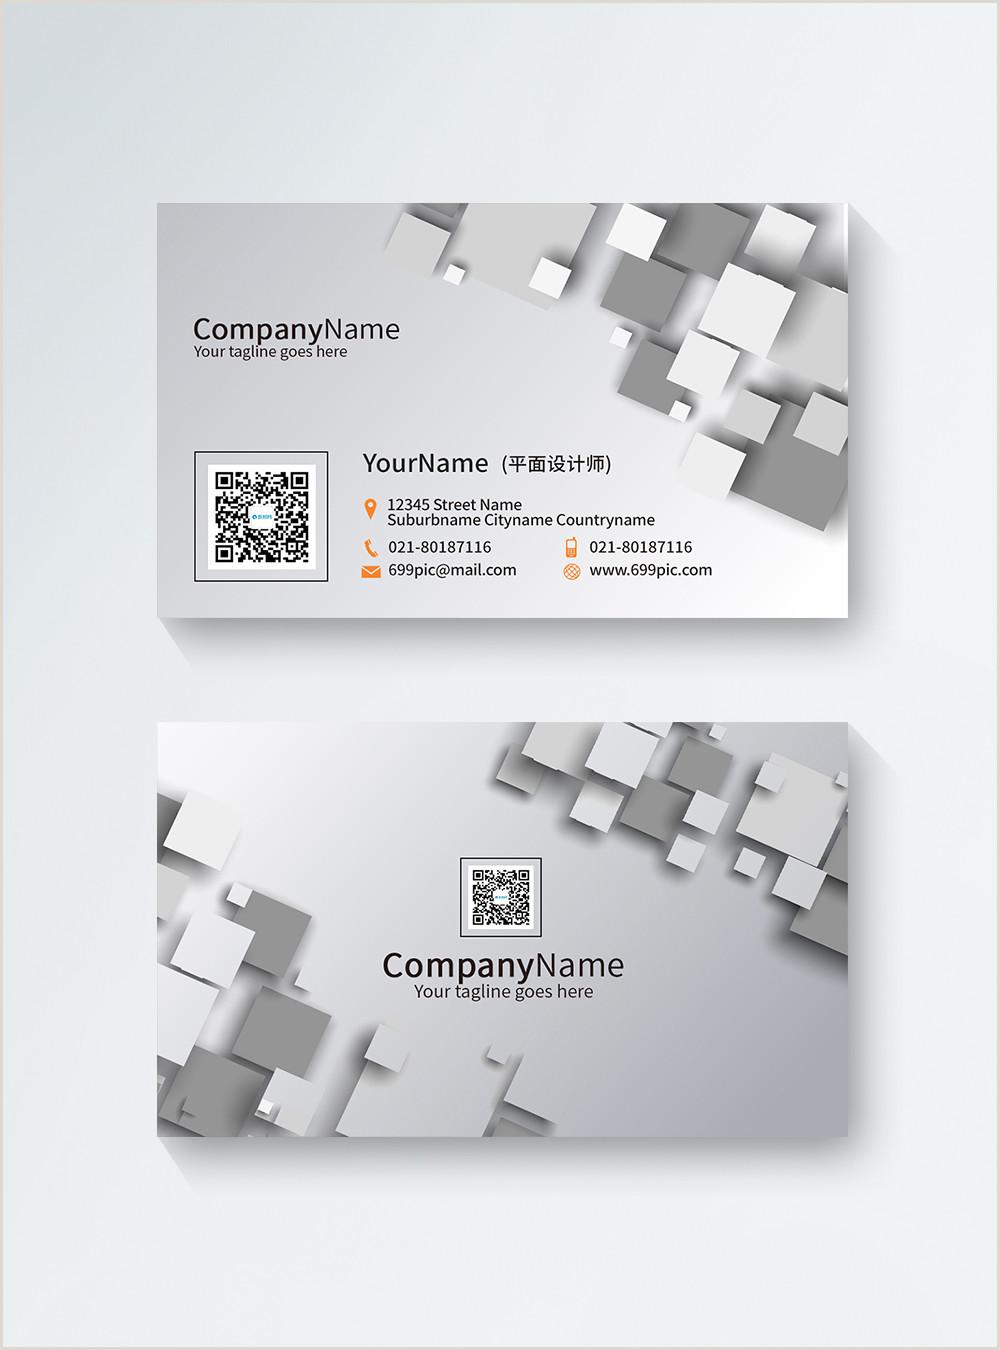 Graphic Designer Business Card Templates Graphic Designer Business Card Template Image Picture Free